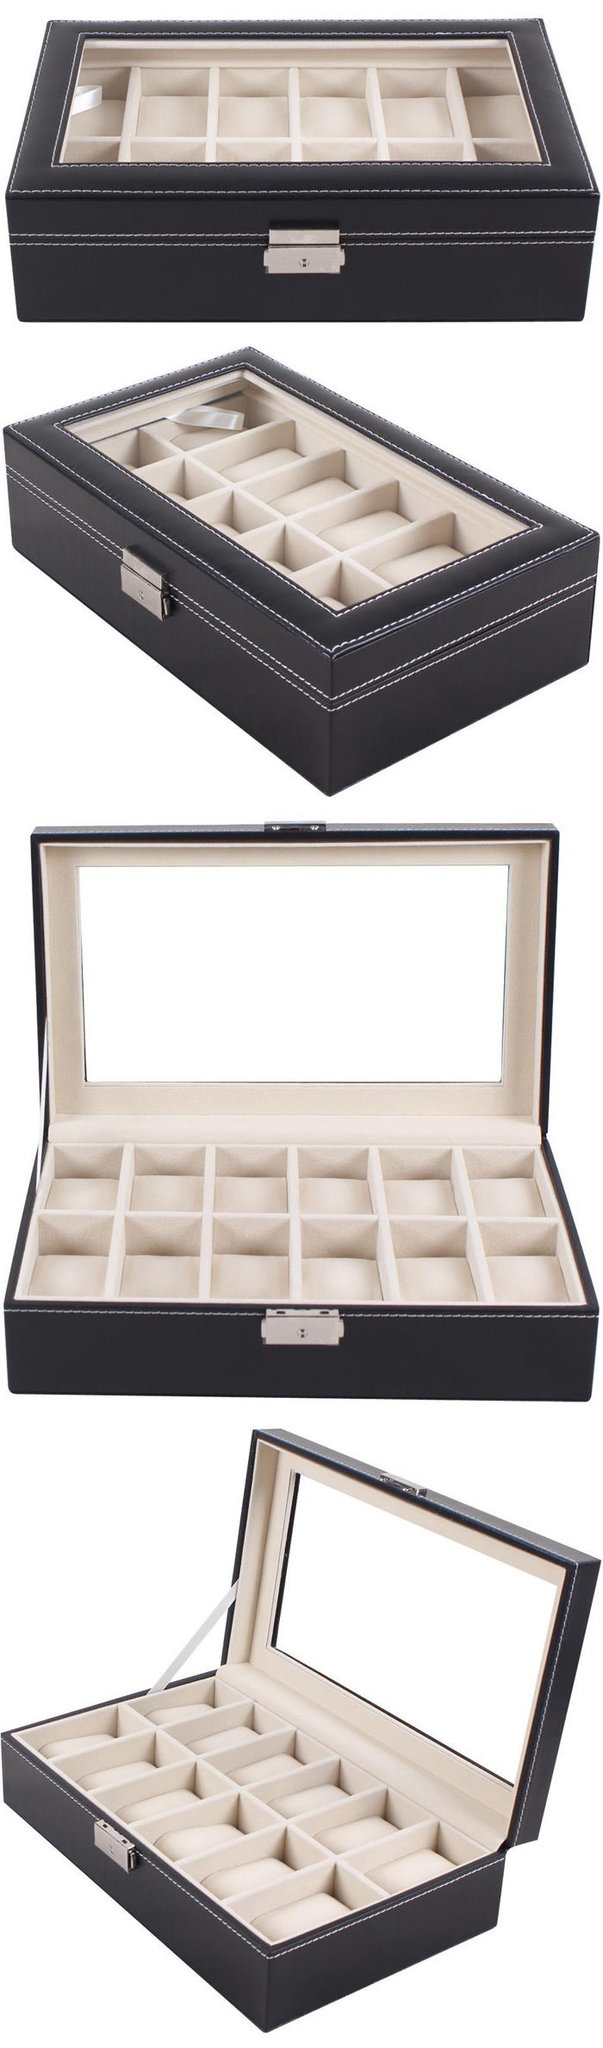 Watch Jewelry Storage Case 12 Grids PU Leather Display Box for Bracelet Shop